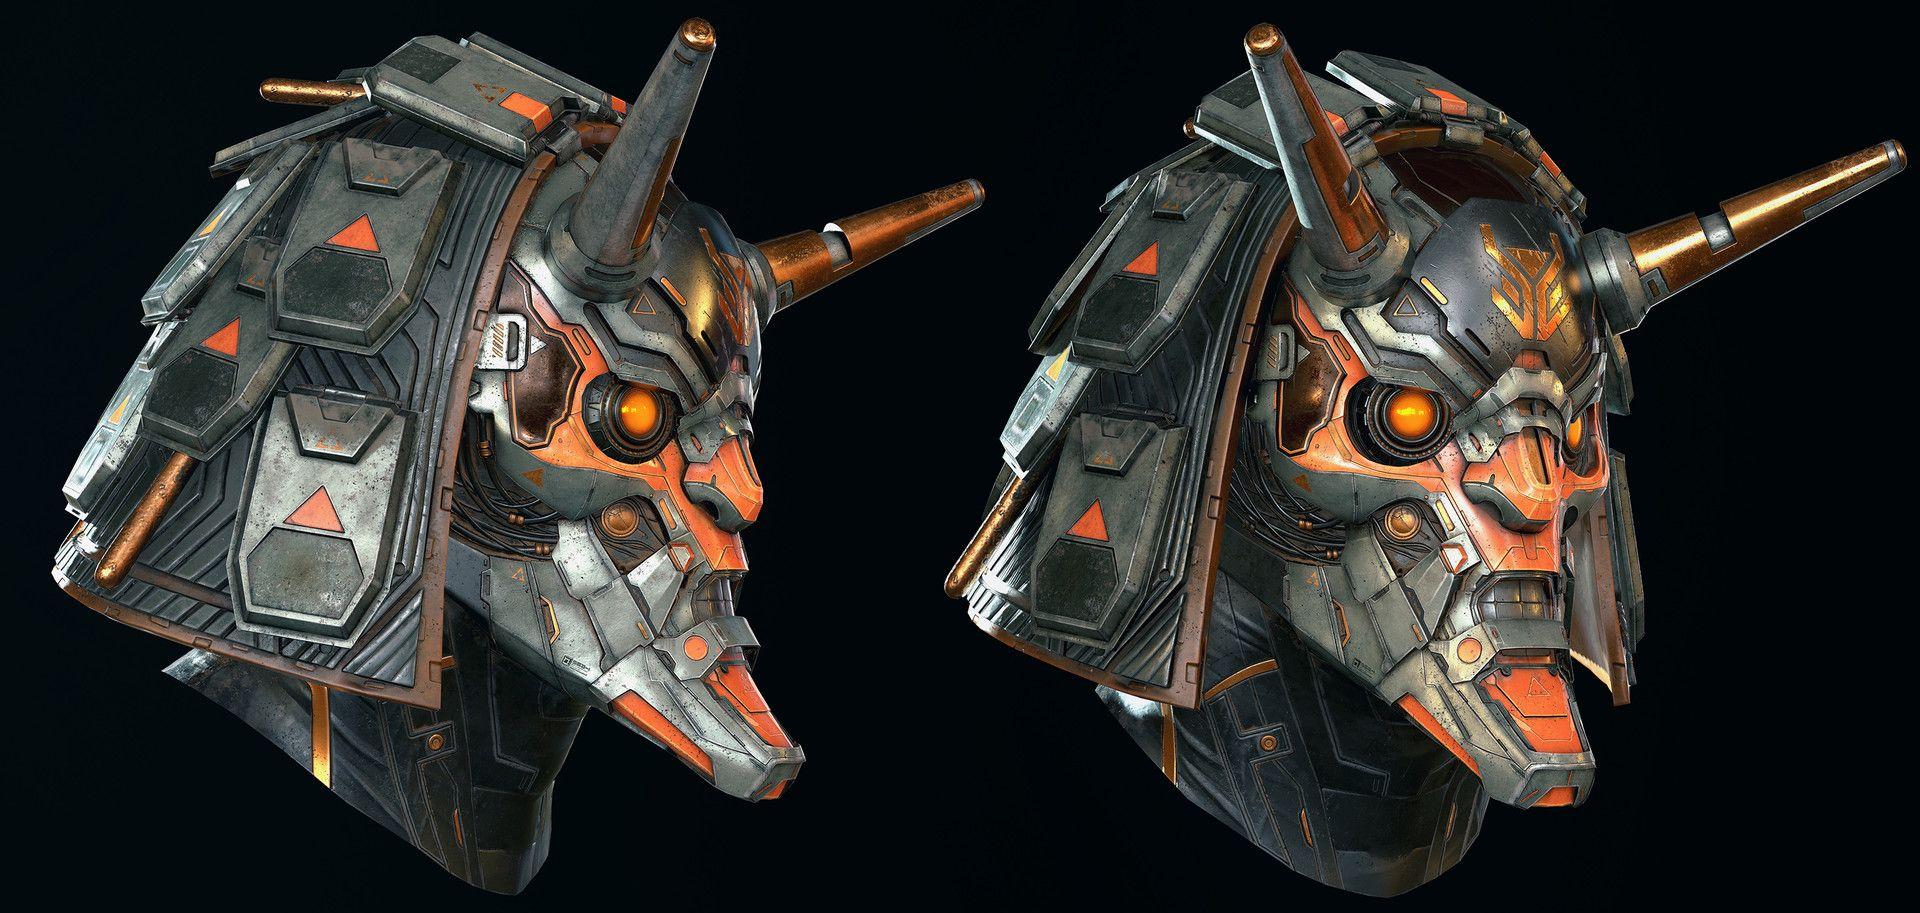 ArtStation - Ronen alternate helmet - Modern Combat Versus - Gameloft, Rodrigue Pralier